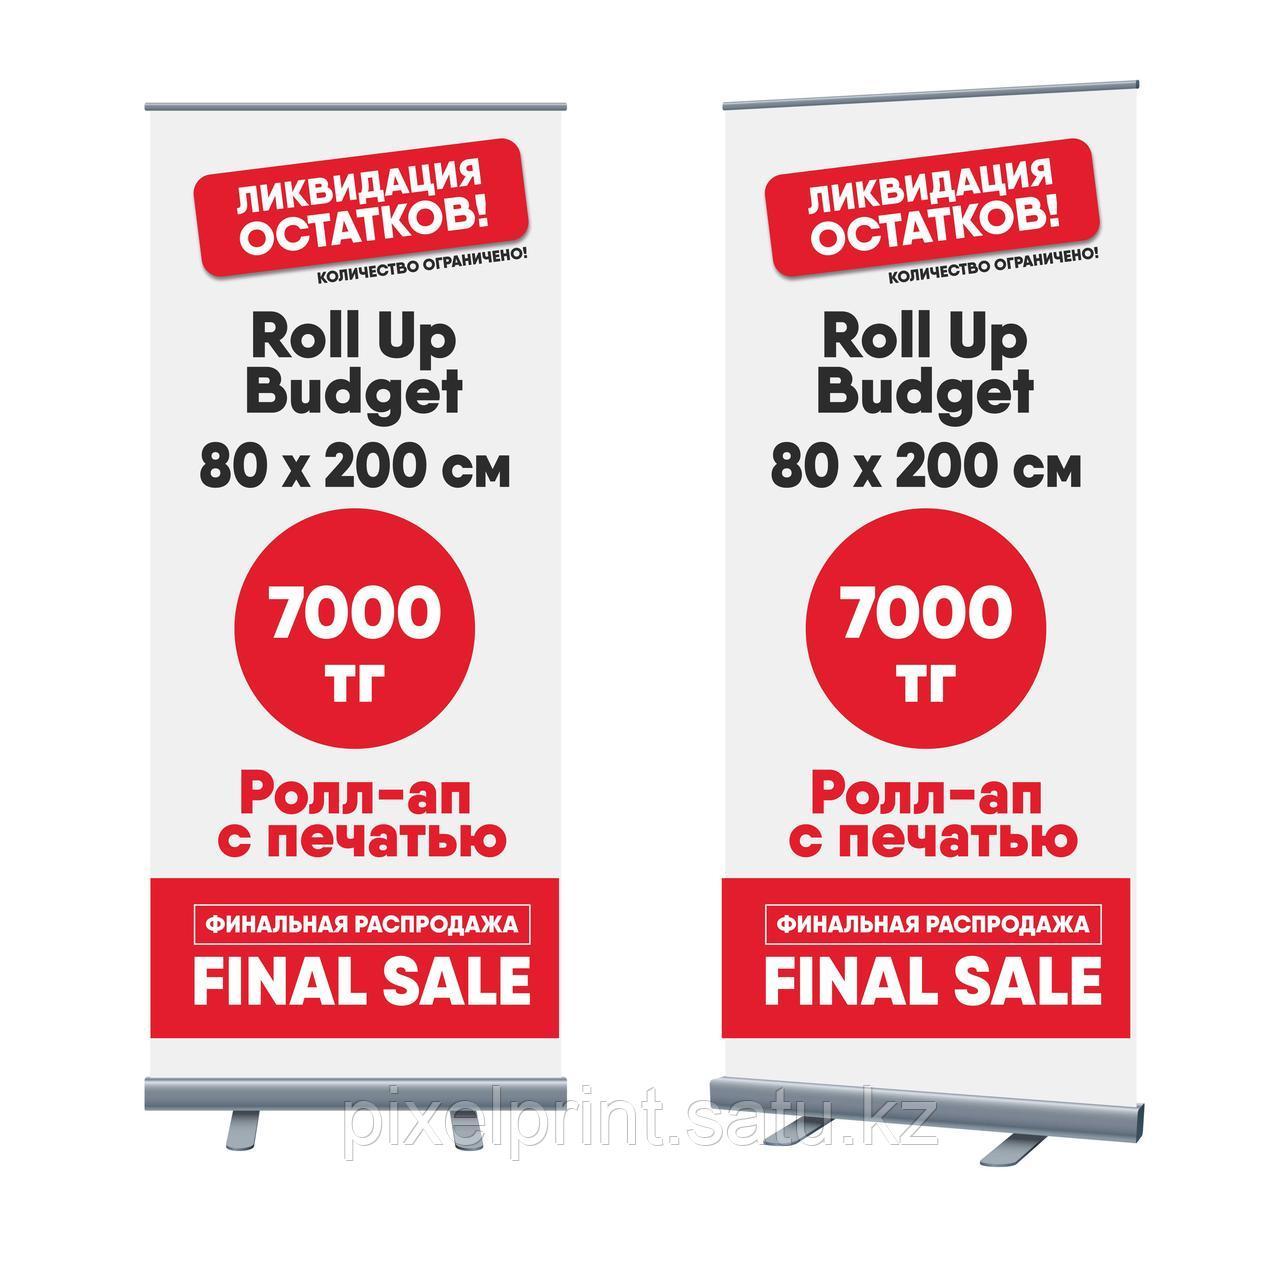 Ролл ап (Roll Up) 80x200 см